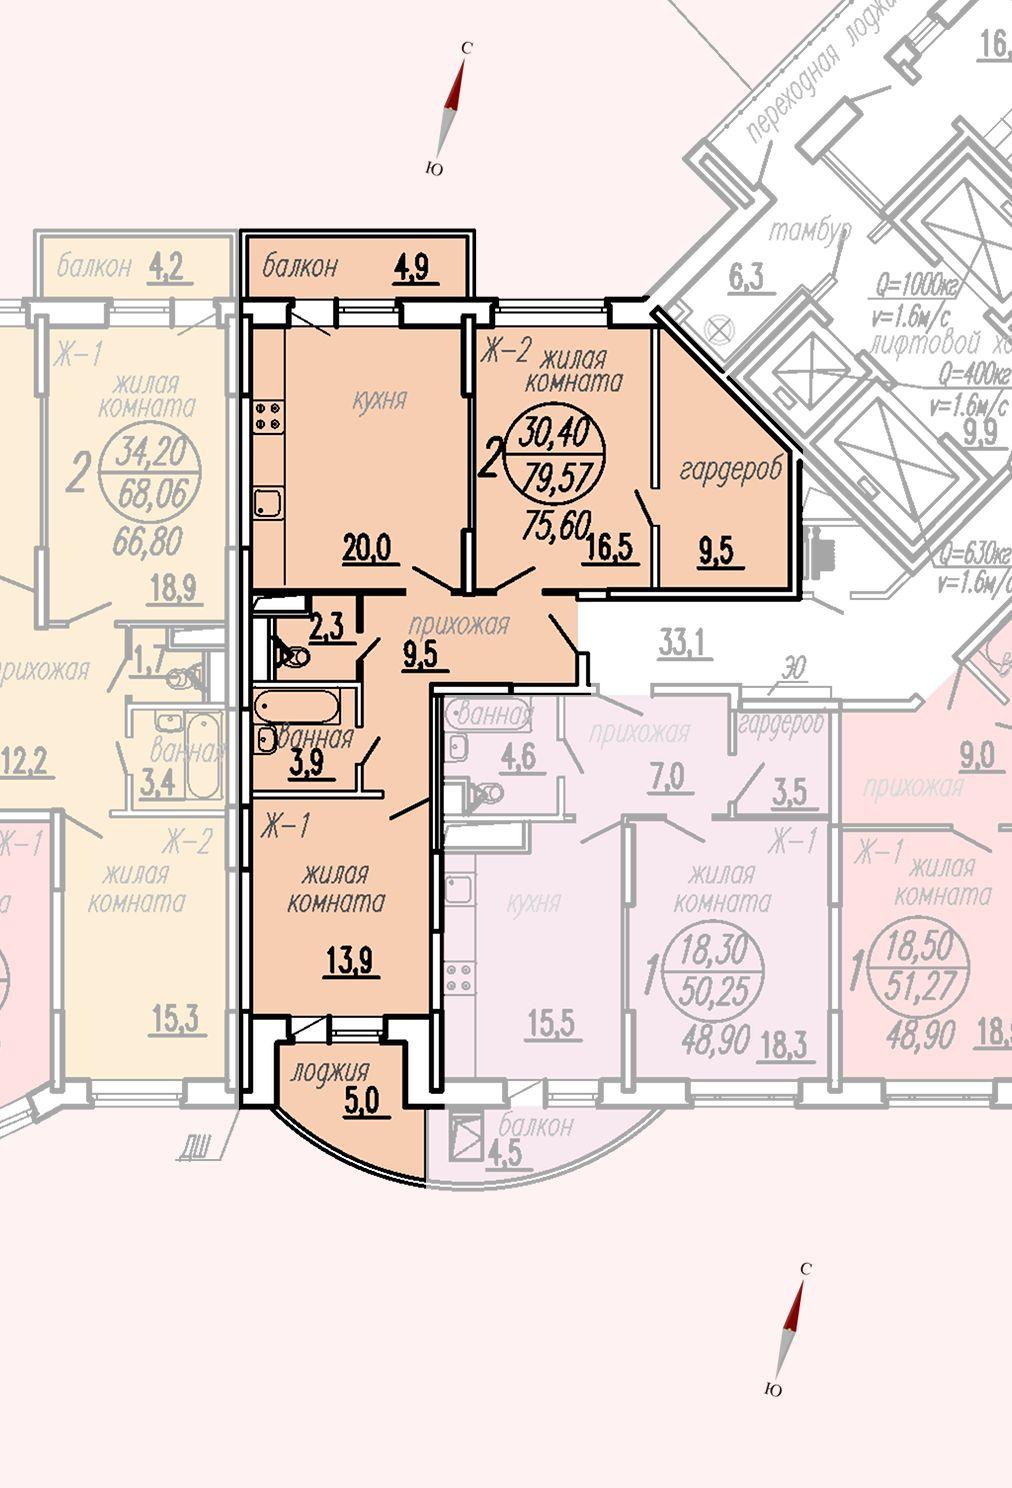 ул. Дирижабельная, д. 1, секция3, квартира 79,57 м2